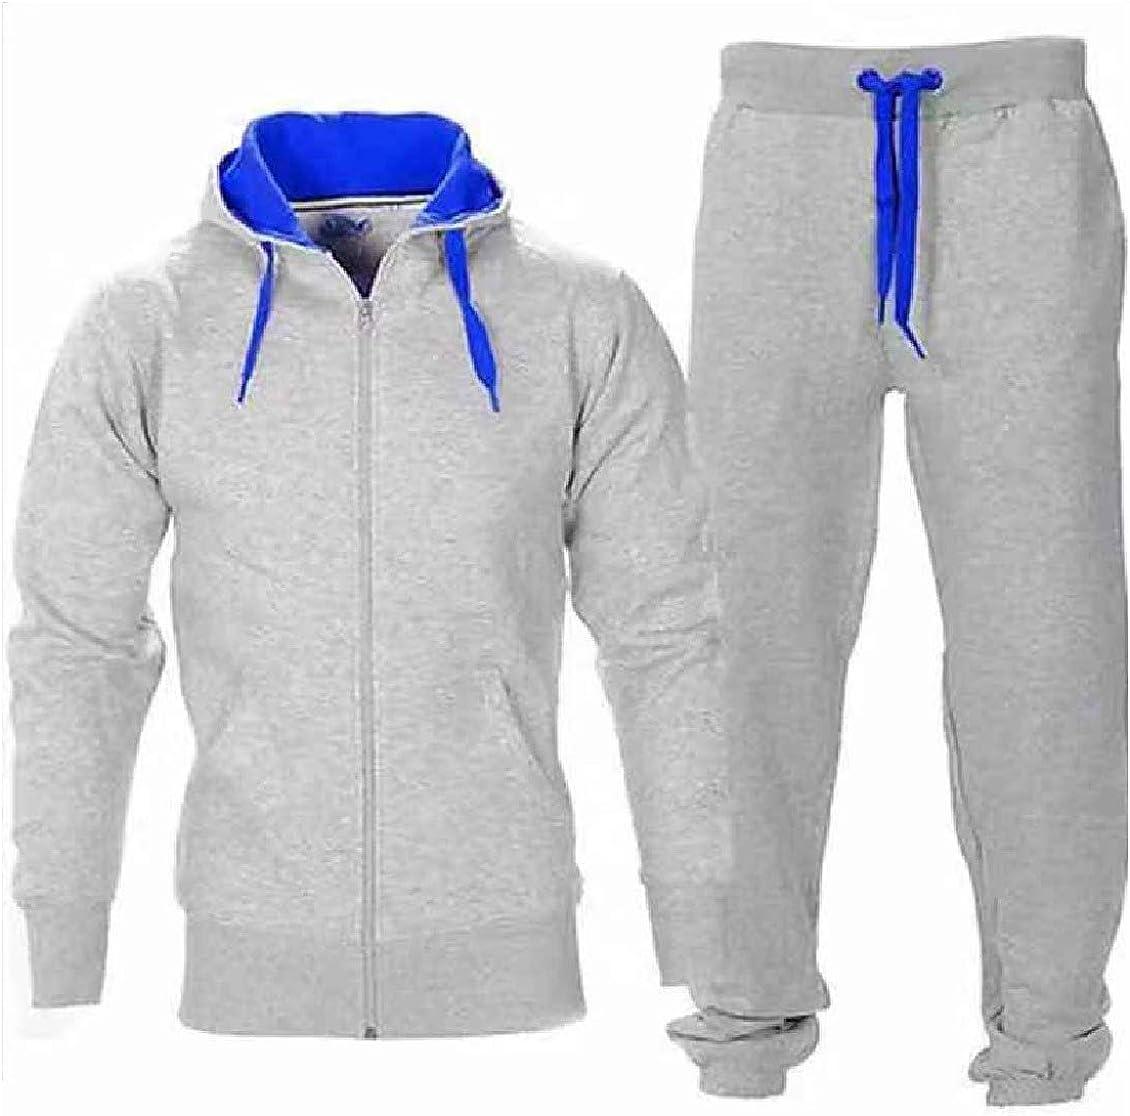 HEFASDM Mens Cardigan Hip Hop 2 Piece Set Hoodie and Pants Suit Set with Hood